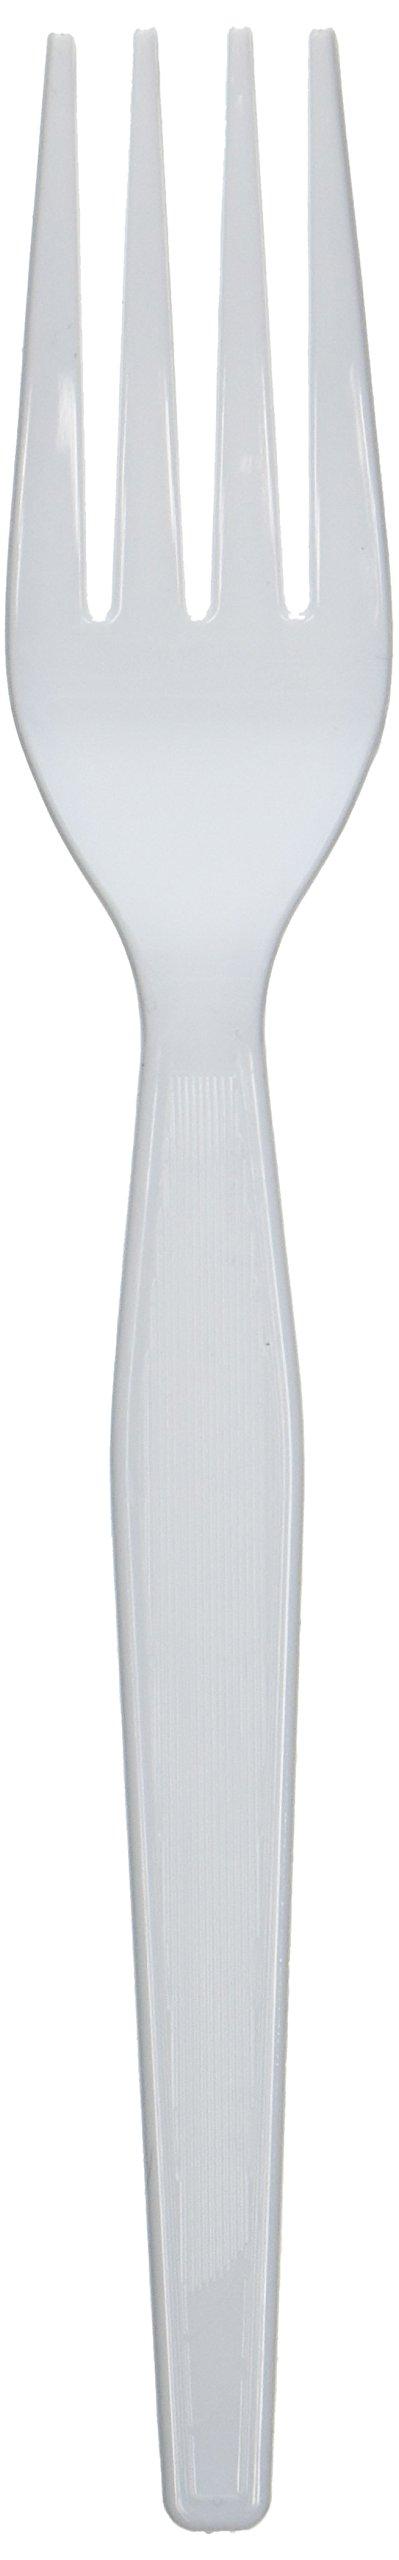 Dixie FH207 Plastic Cutlery, Heavyweight Forks, White, 100/Box